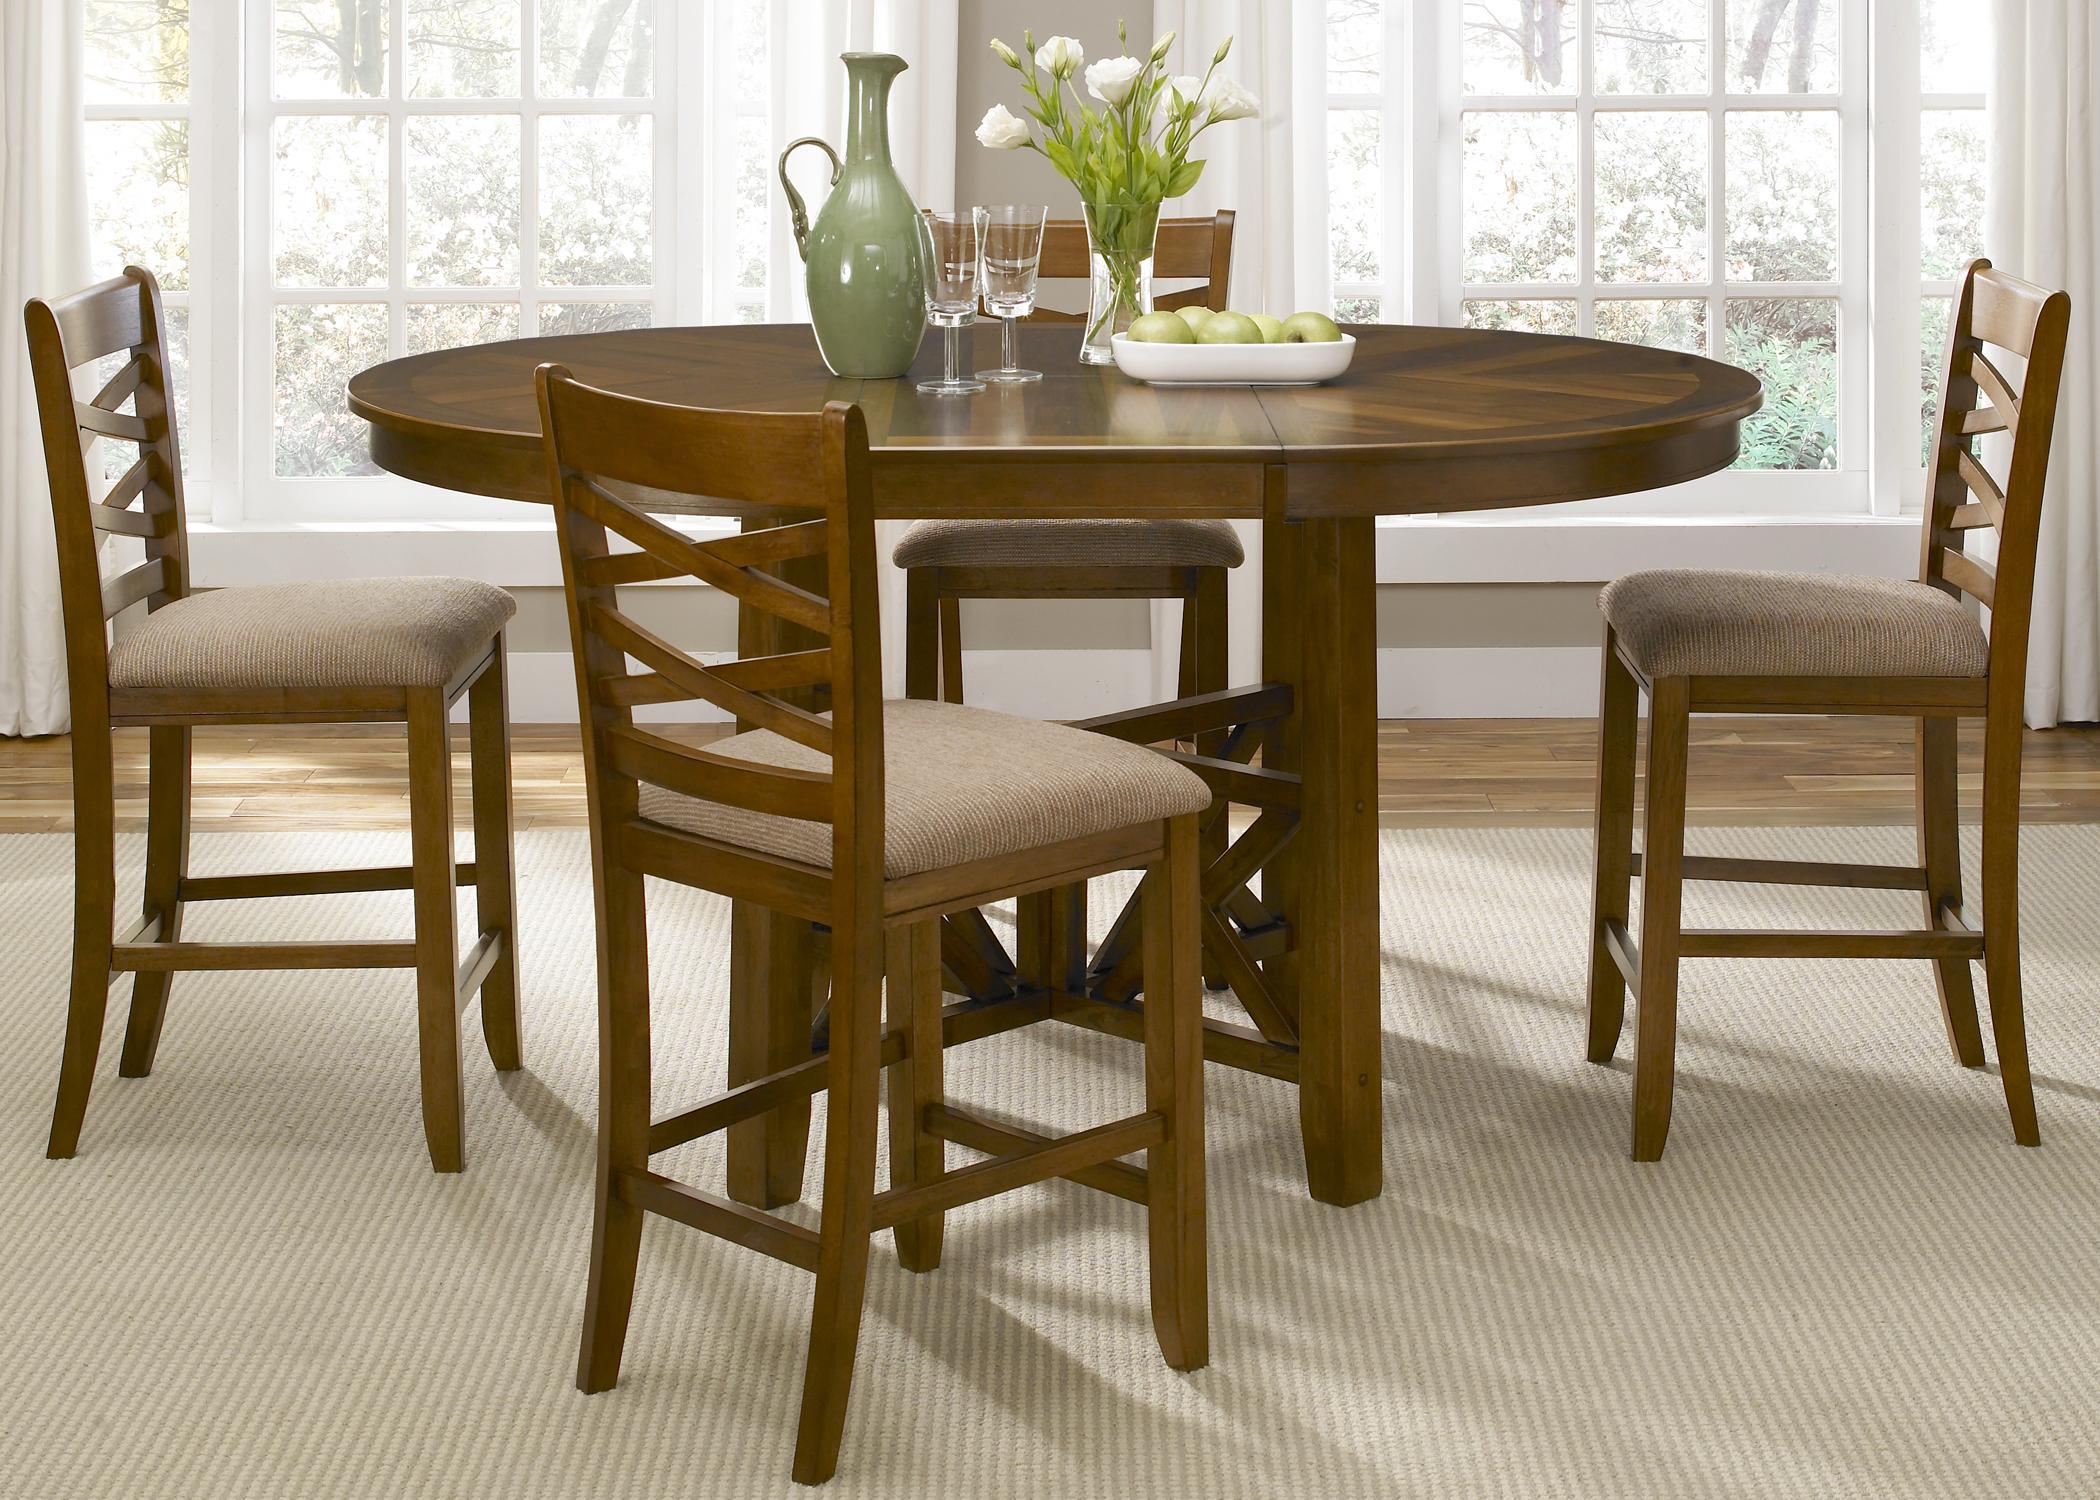 Liberty Furniture Bistro 5 Piece Gathering Height Dining Set - Item Number: 64-CD-SET14